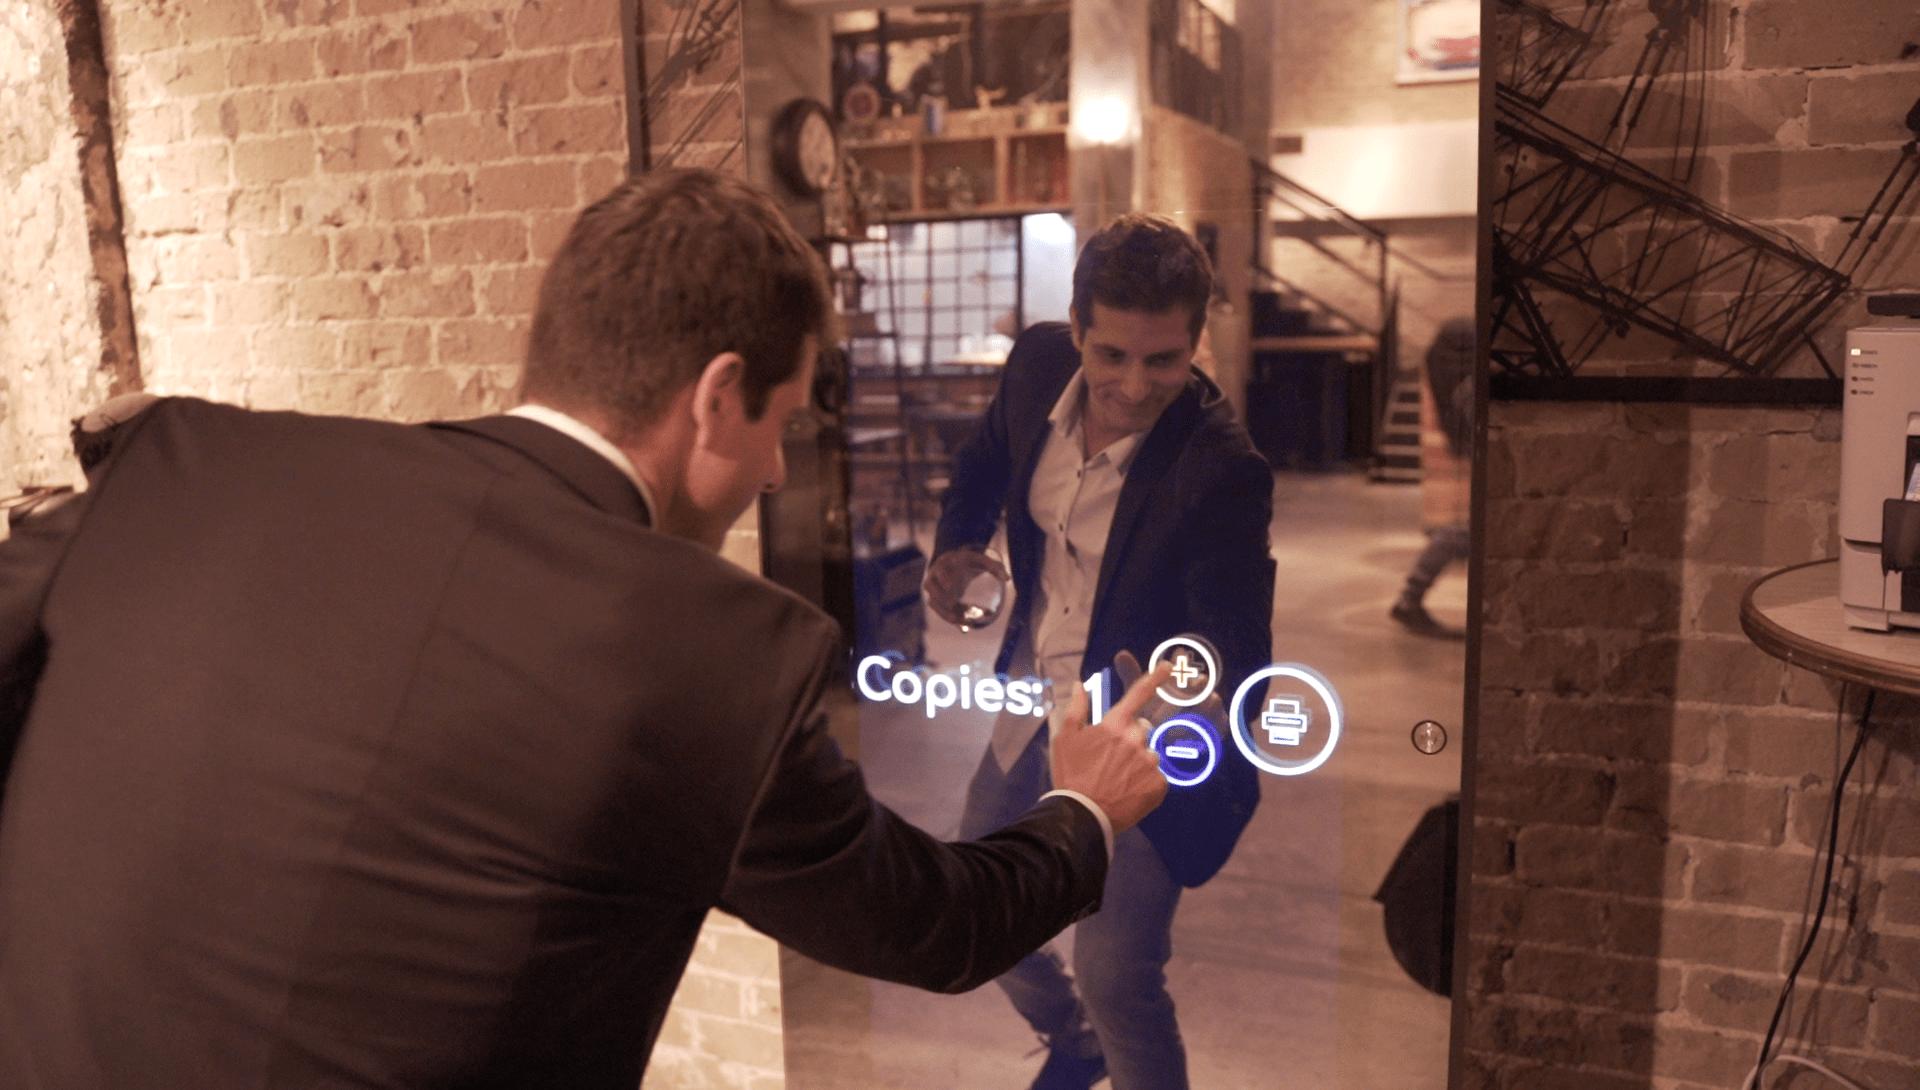 Selfie Mirror X The Newest Photobooth Craze To Hit